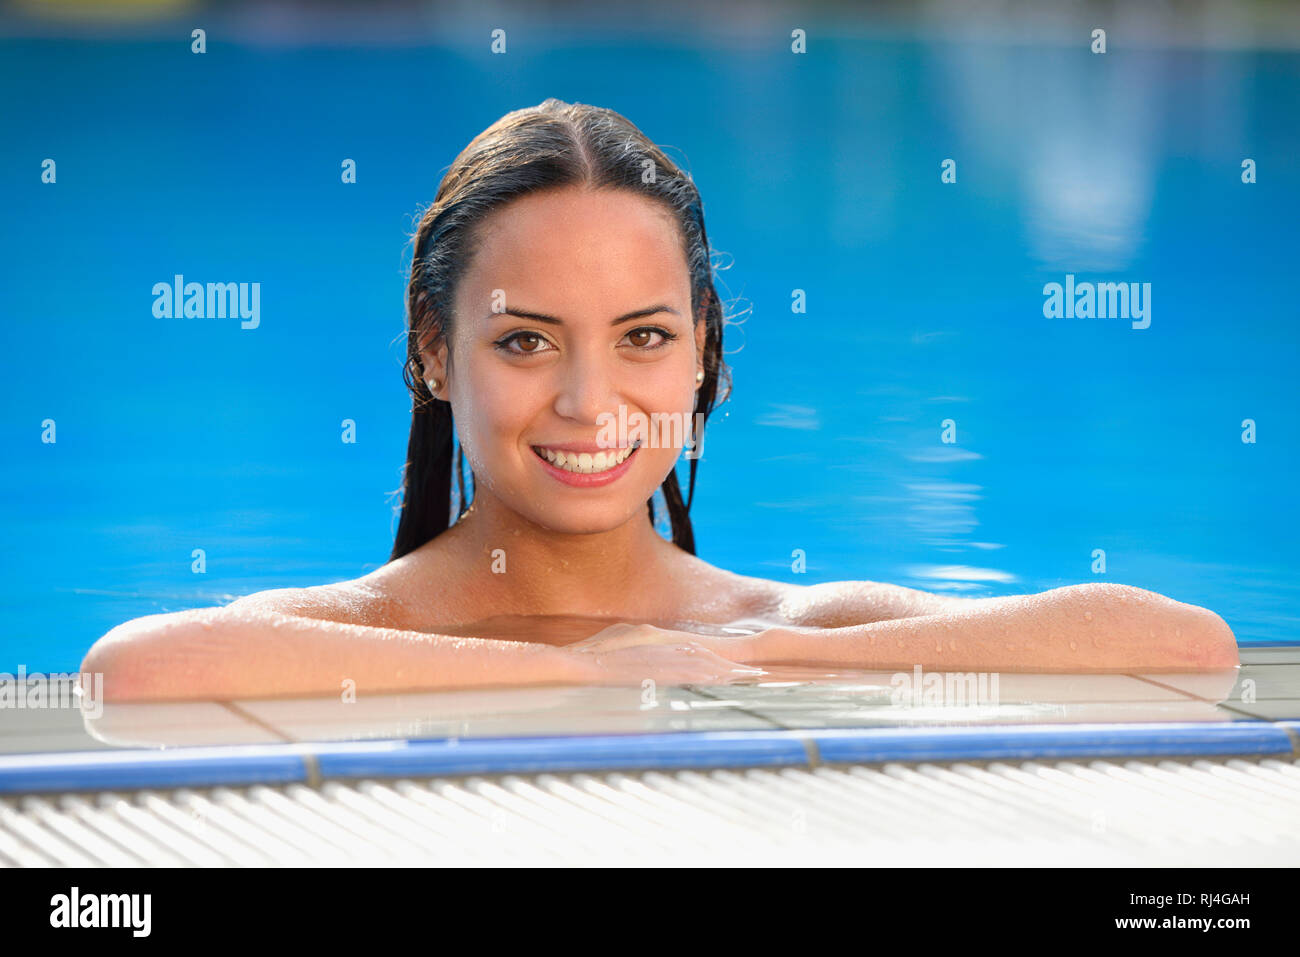 Frau, jung, Halbportrait, Bikini, Beckenrand, Freibad, frontal, Blick Kamera - Stock Image